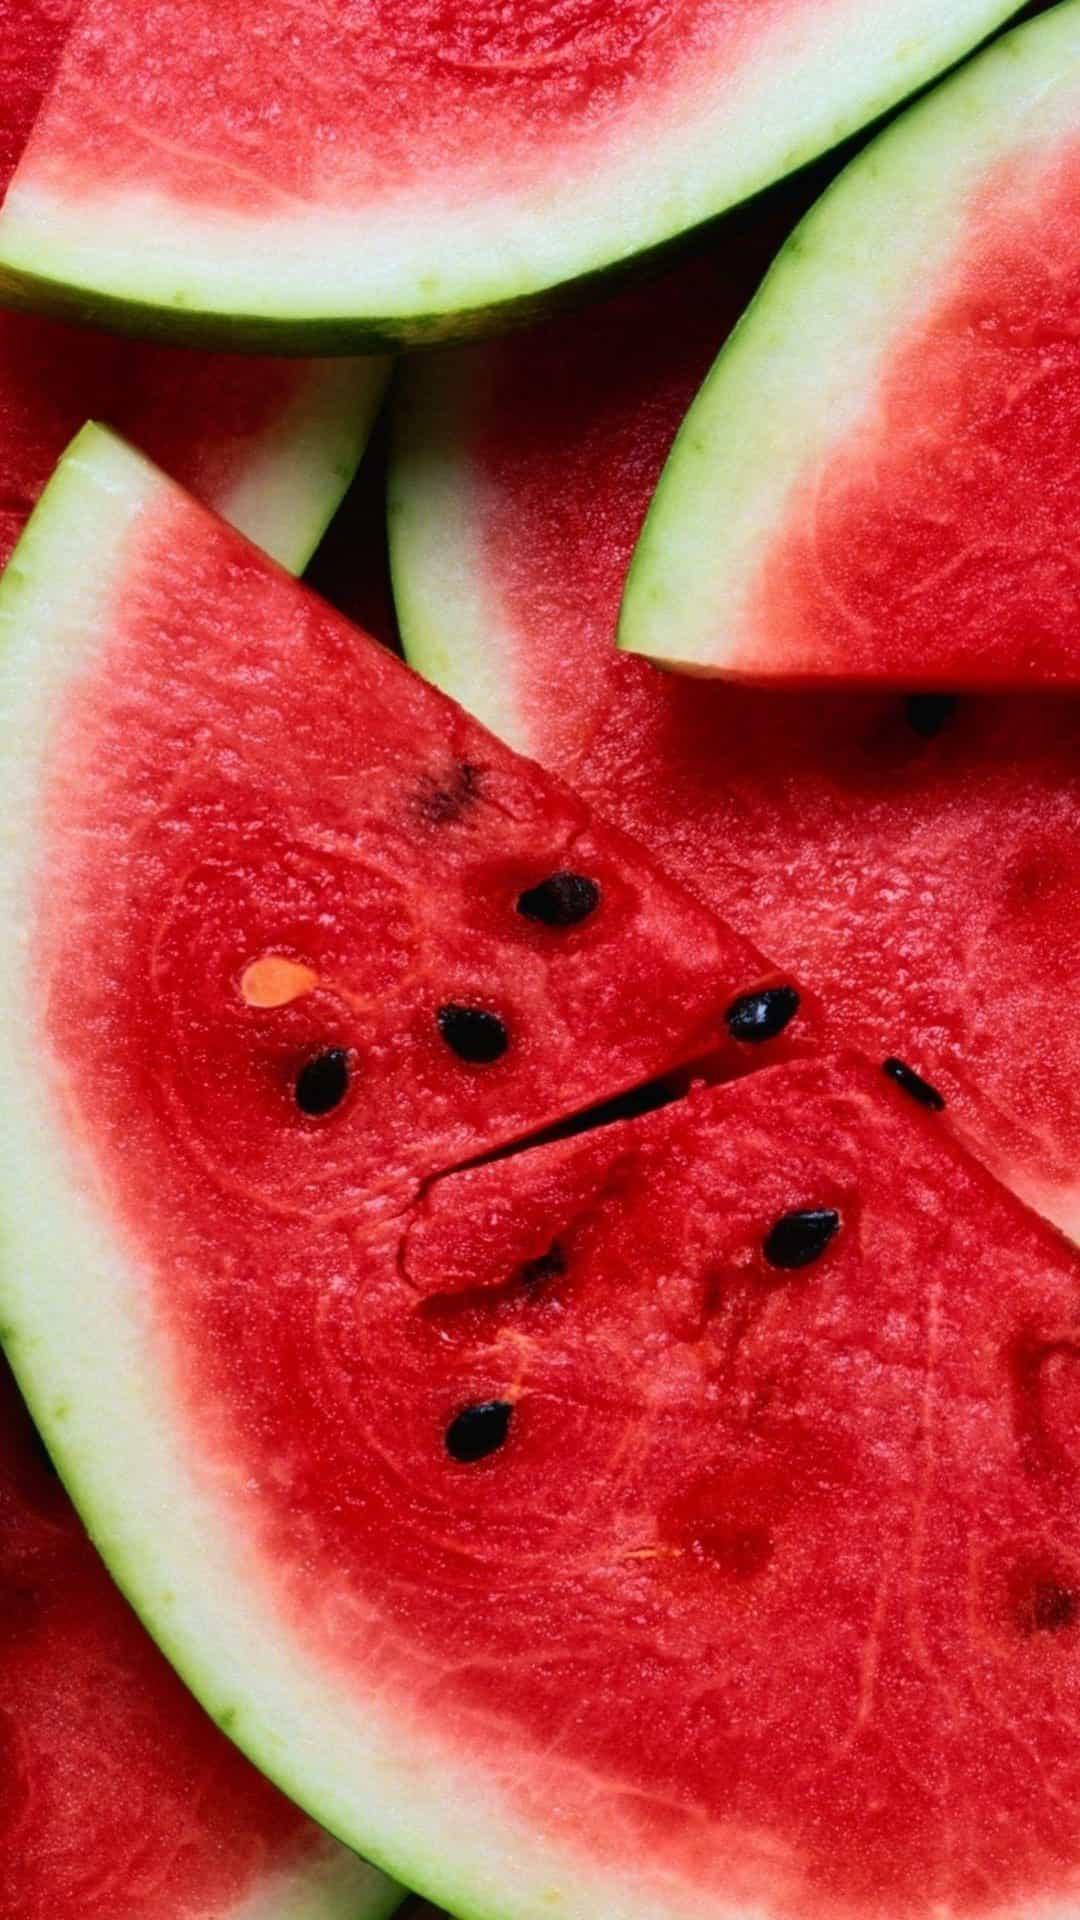 Watermelon Pieces Lockscreen Android Wallpaper